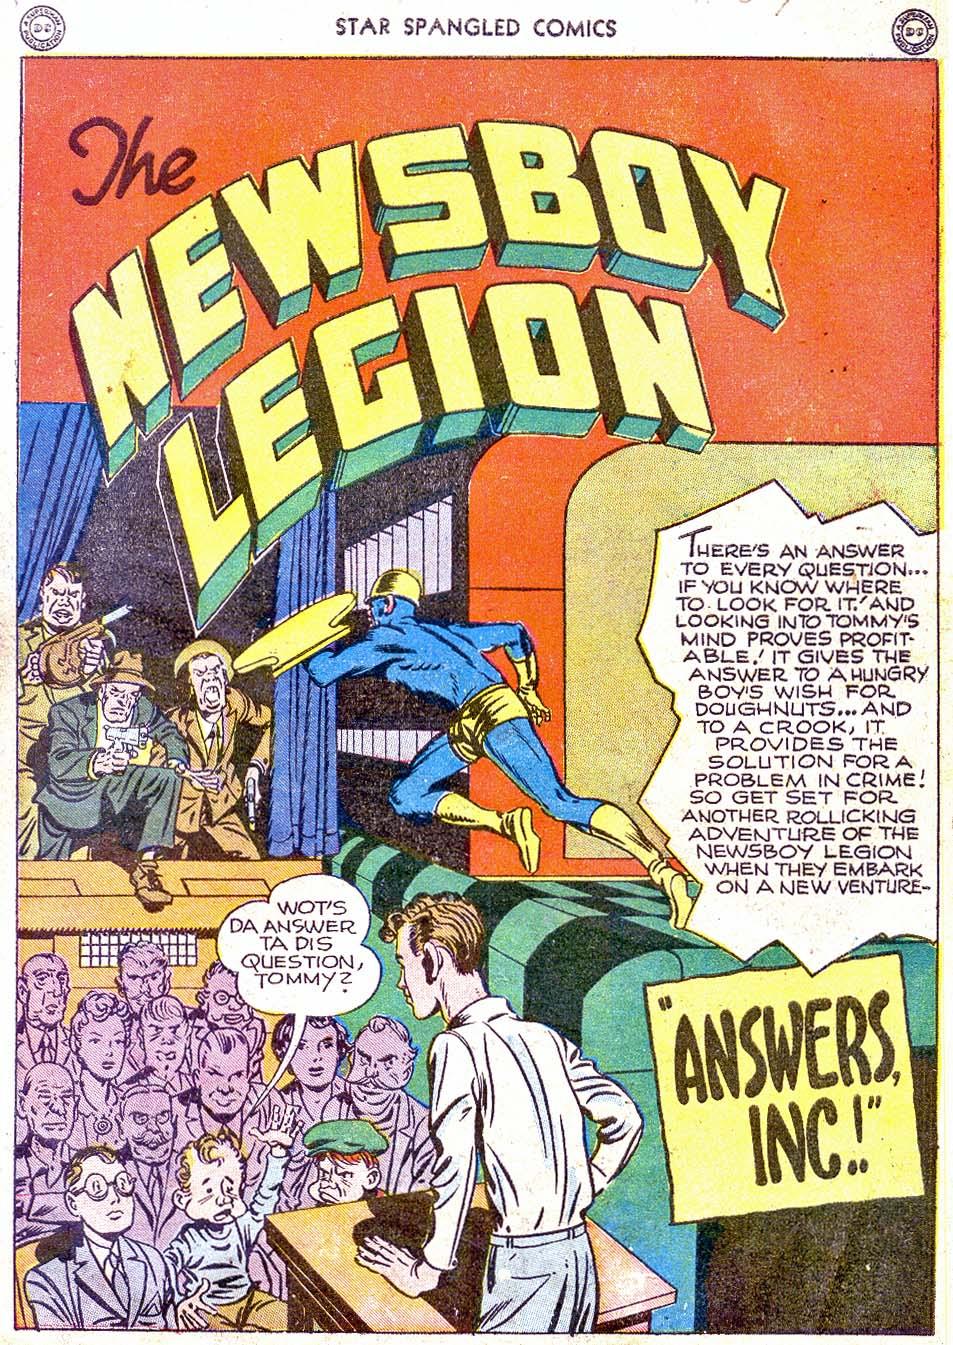 Star Spangled Comics (1941) 59 Page 3